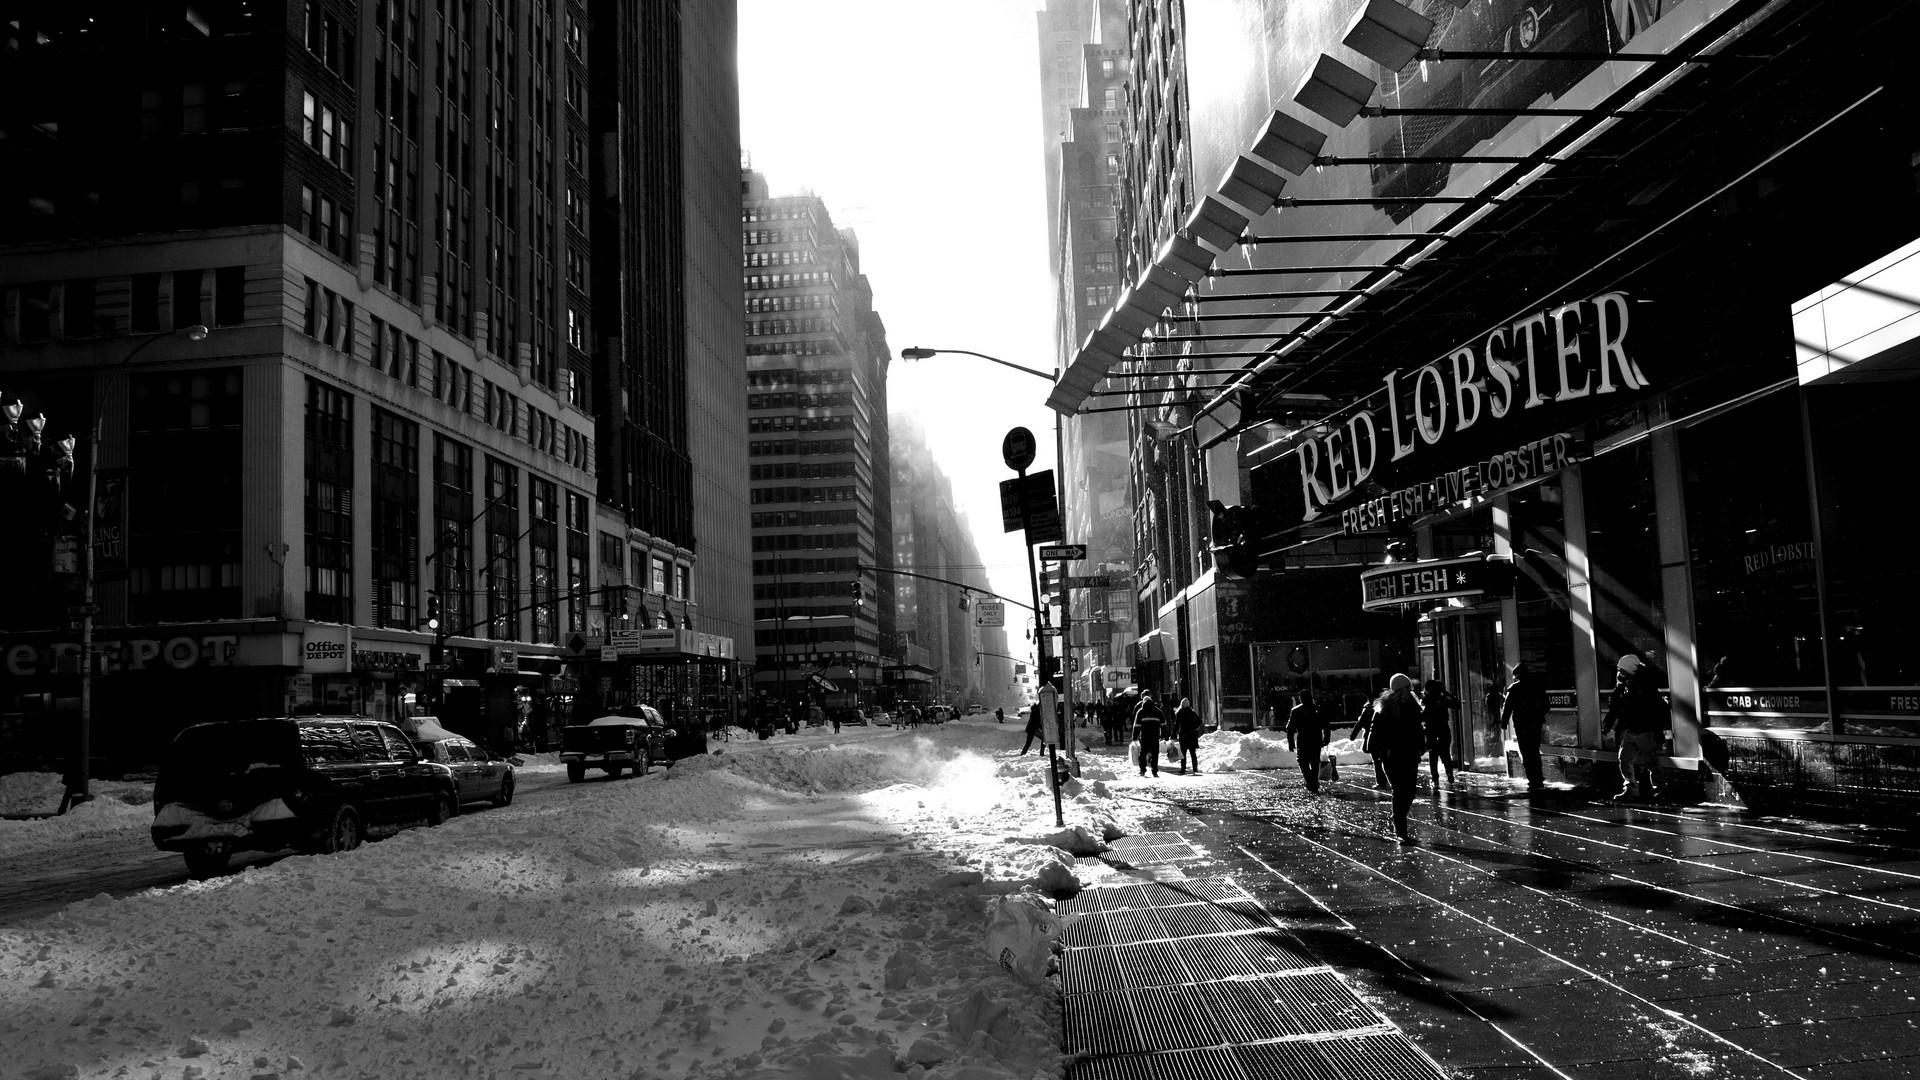 Wallpaper City Street Cityscape Night Building Snow Road